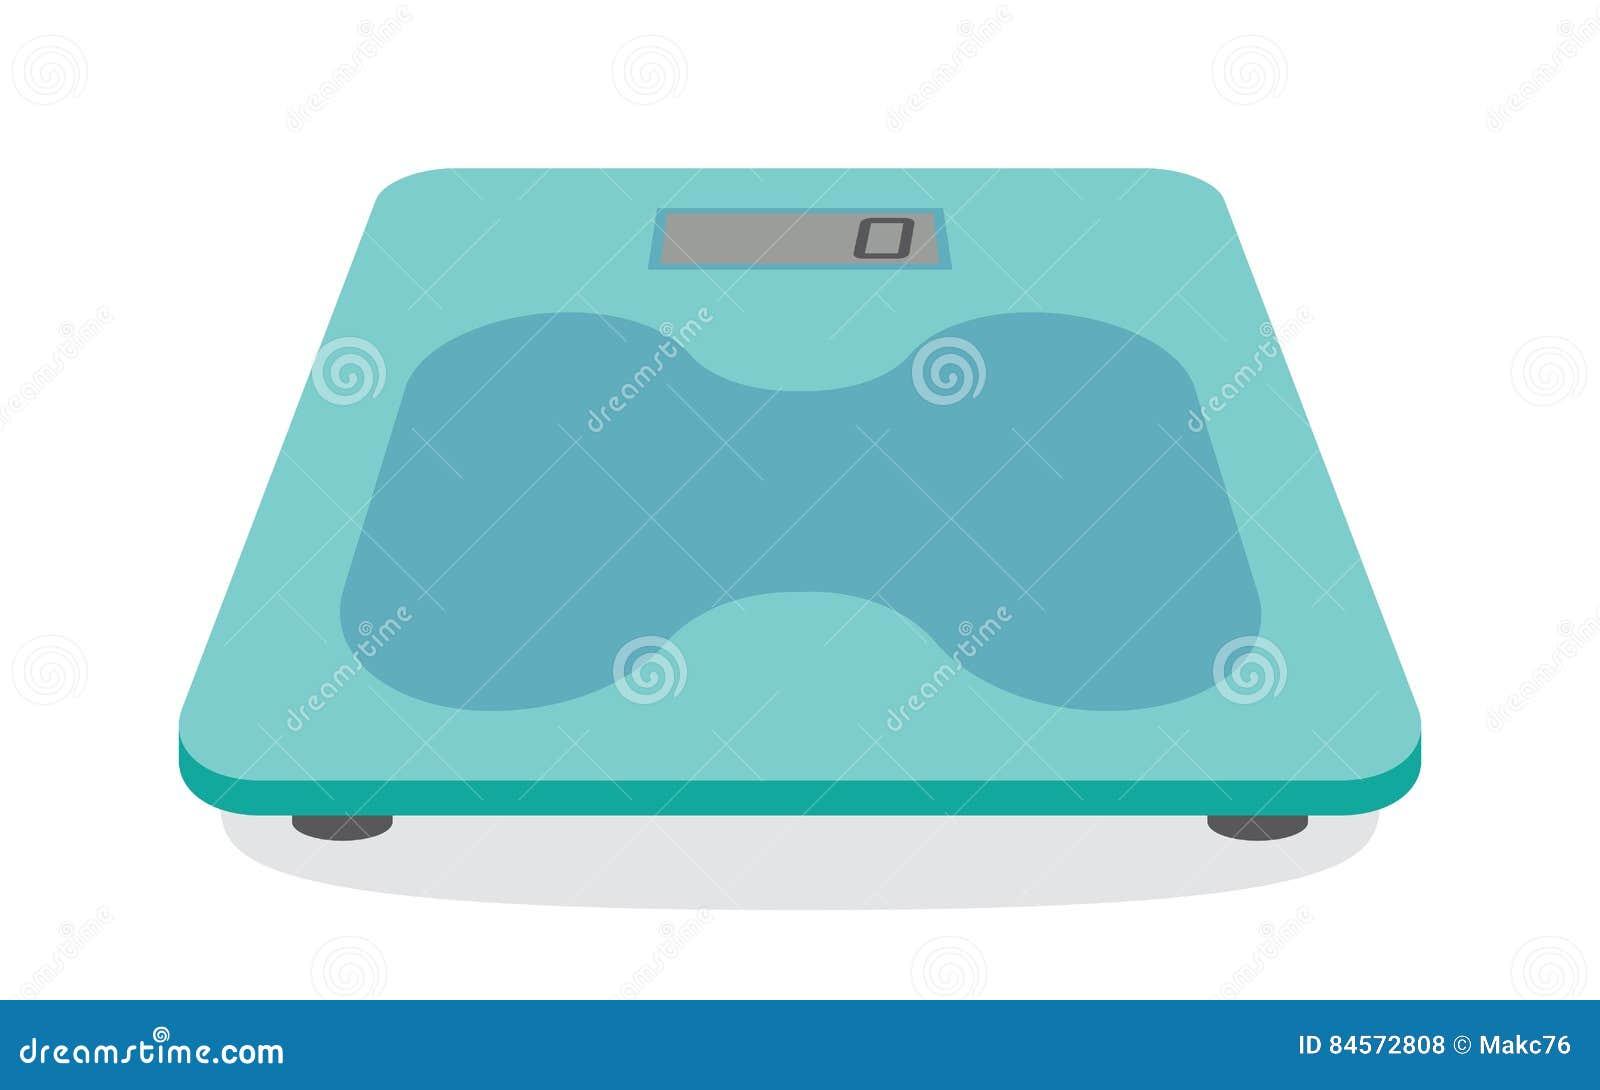 Bathroom Scale Icon. Stock Vector - Image: 84572808